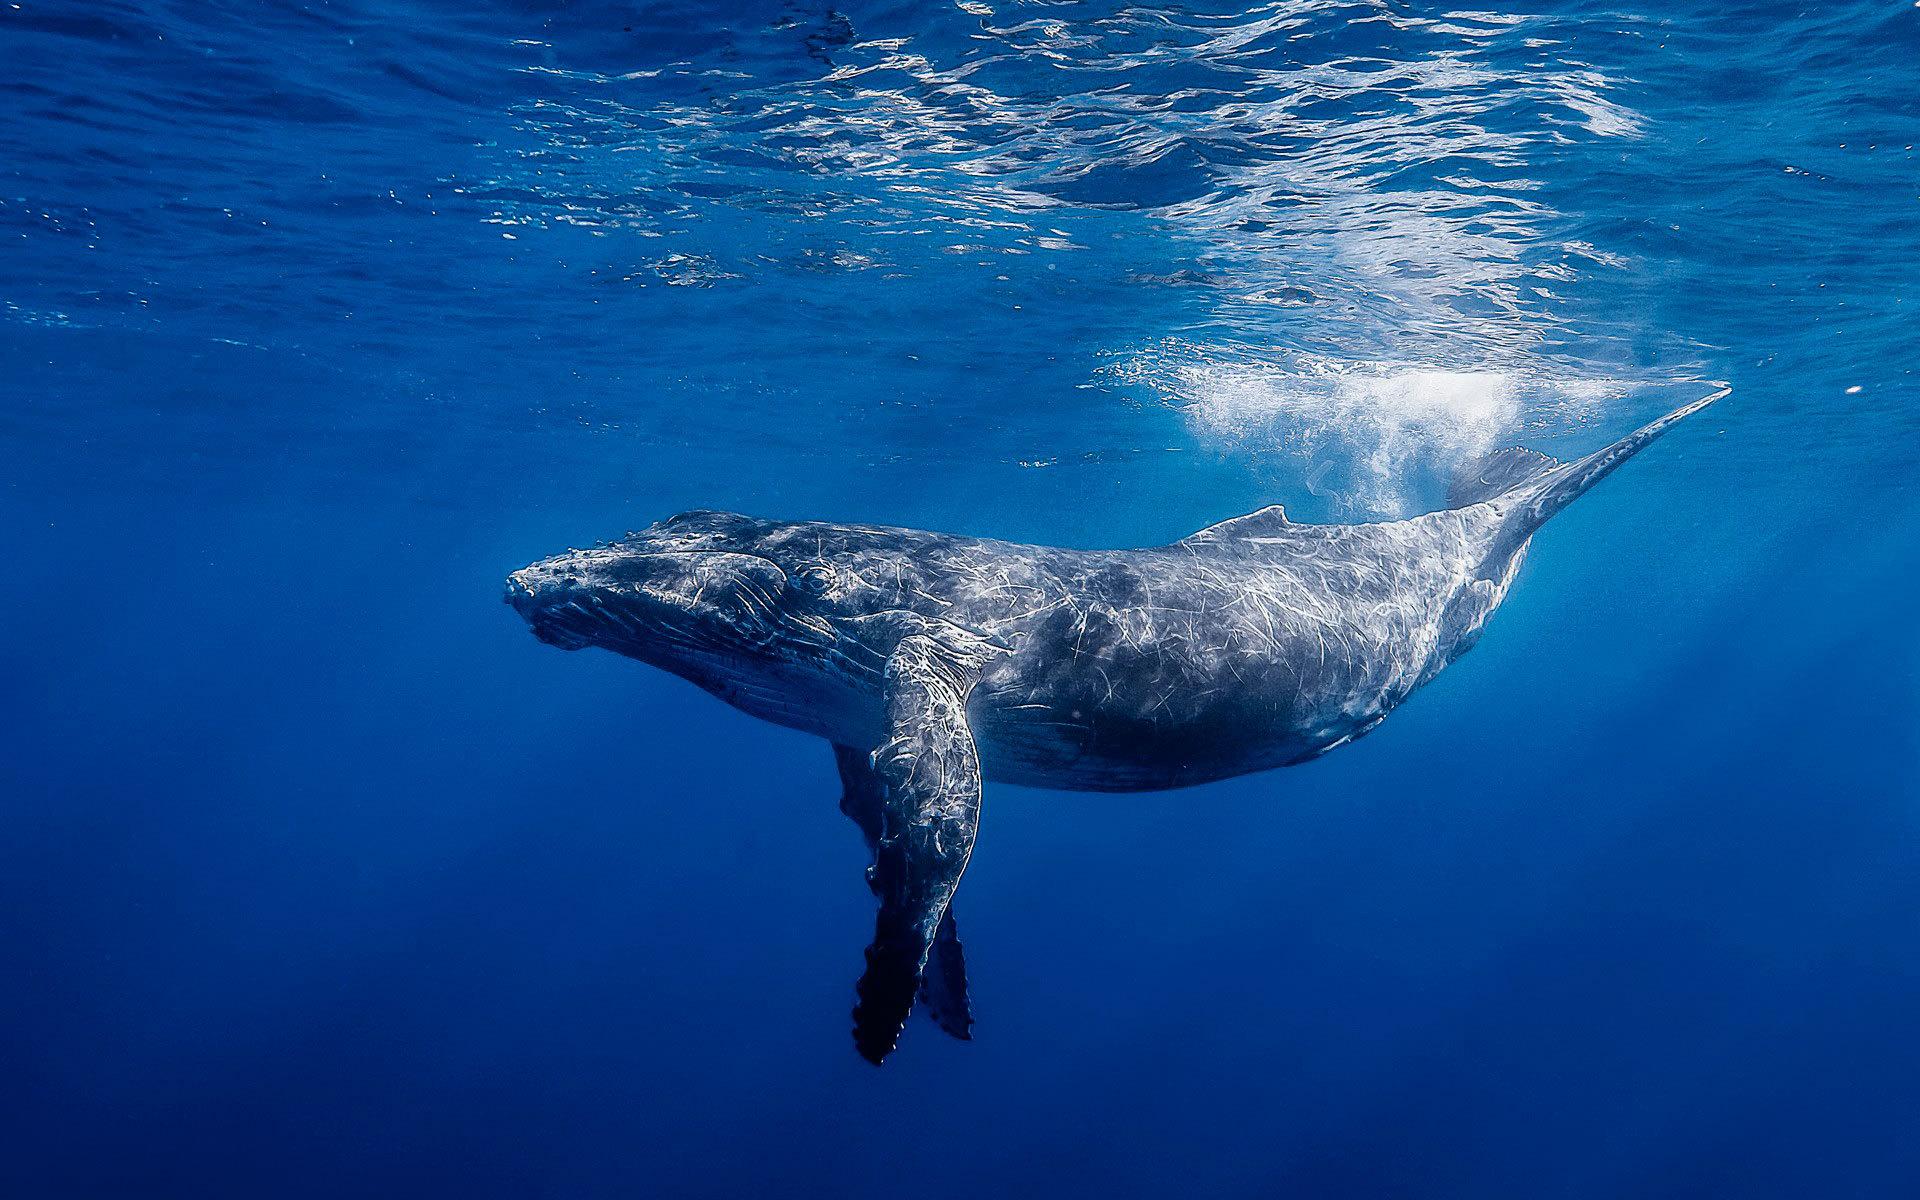 Helmut Lang создали совместный проект с Parley for the Oceans